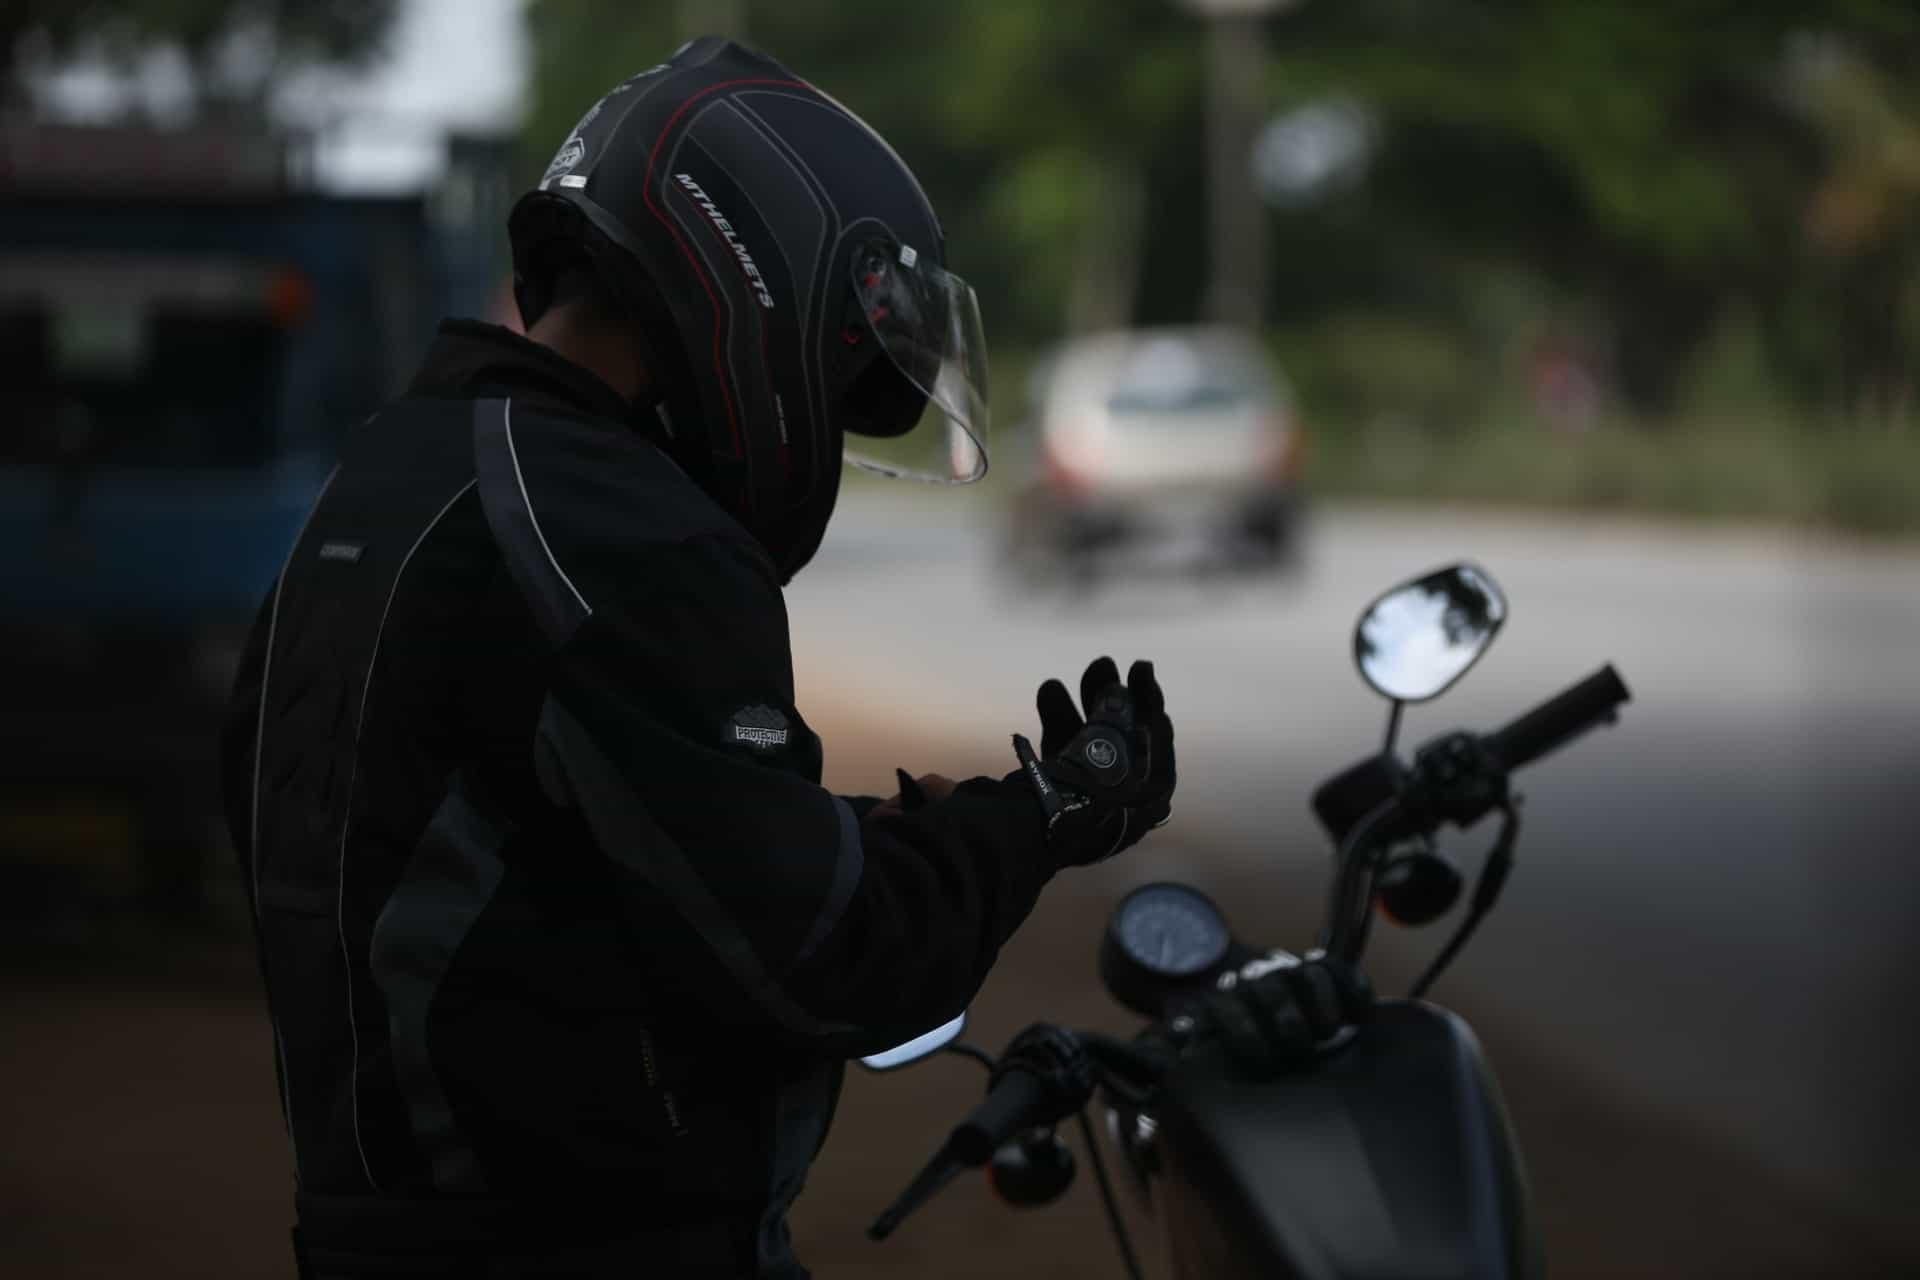 man taking off gloves